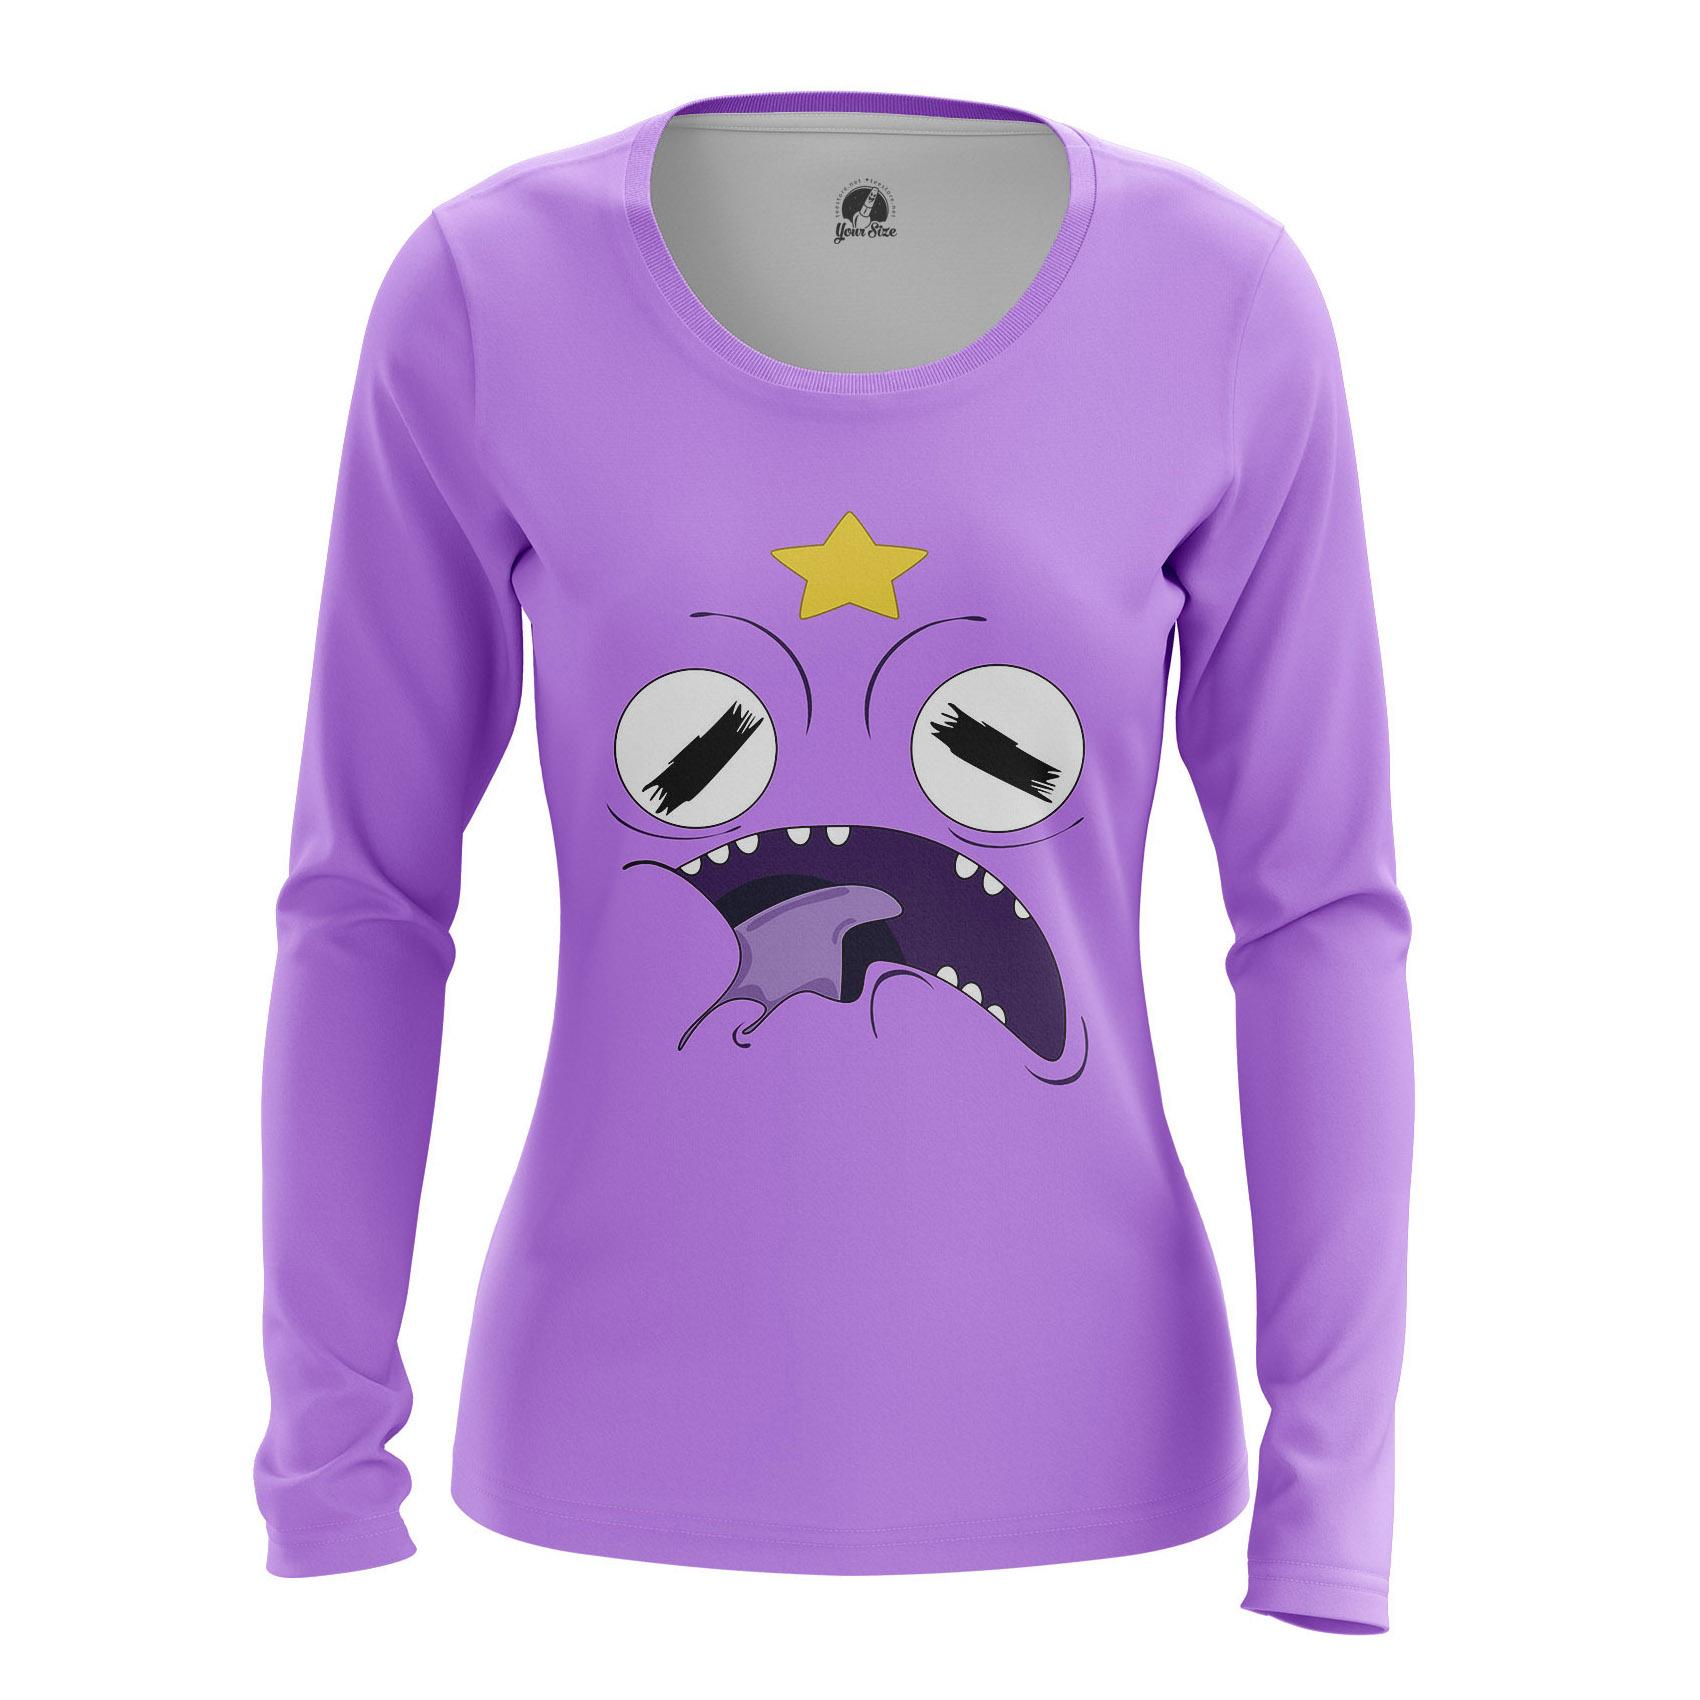 Collectibles Women'S Raglan Princess Lumpy Face Adventure Time